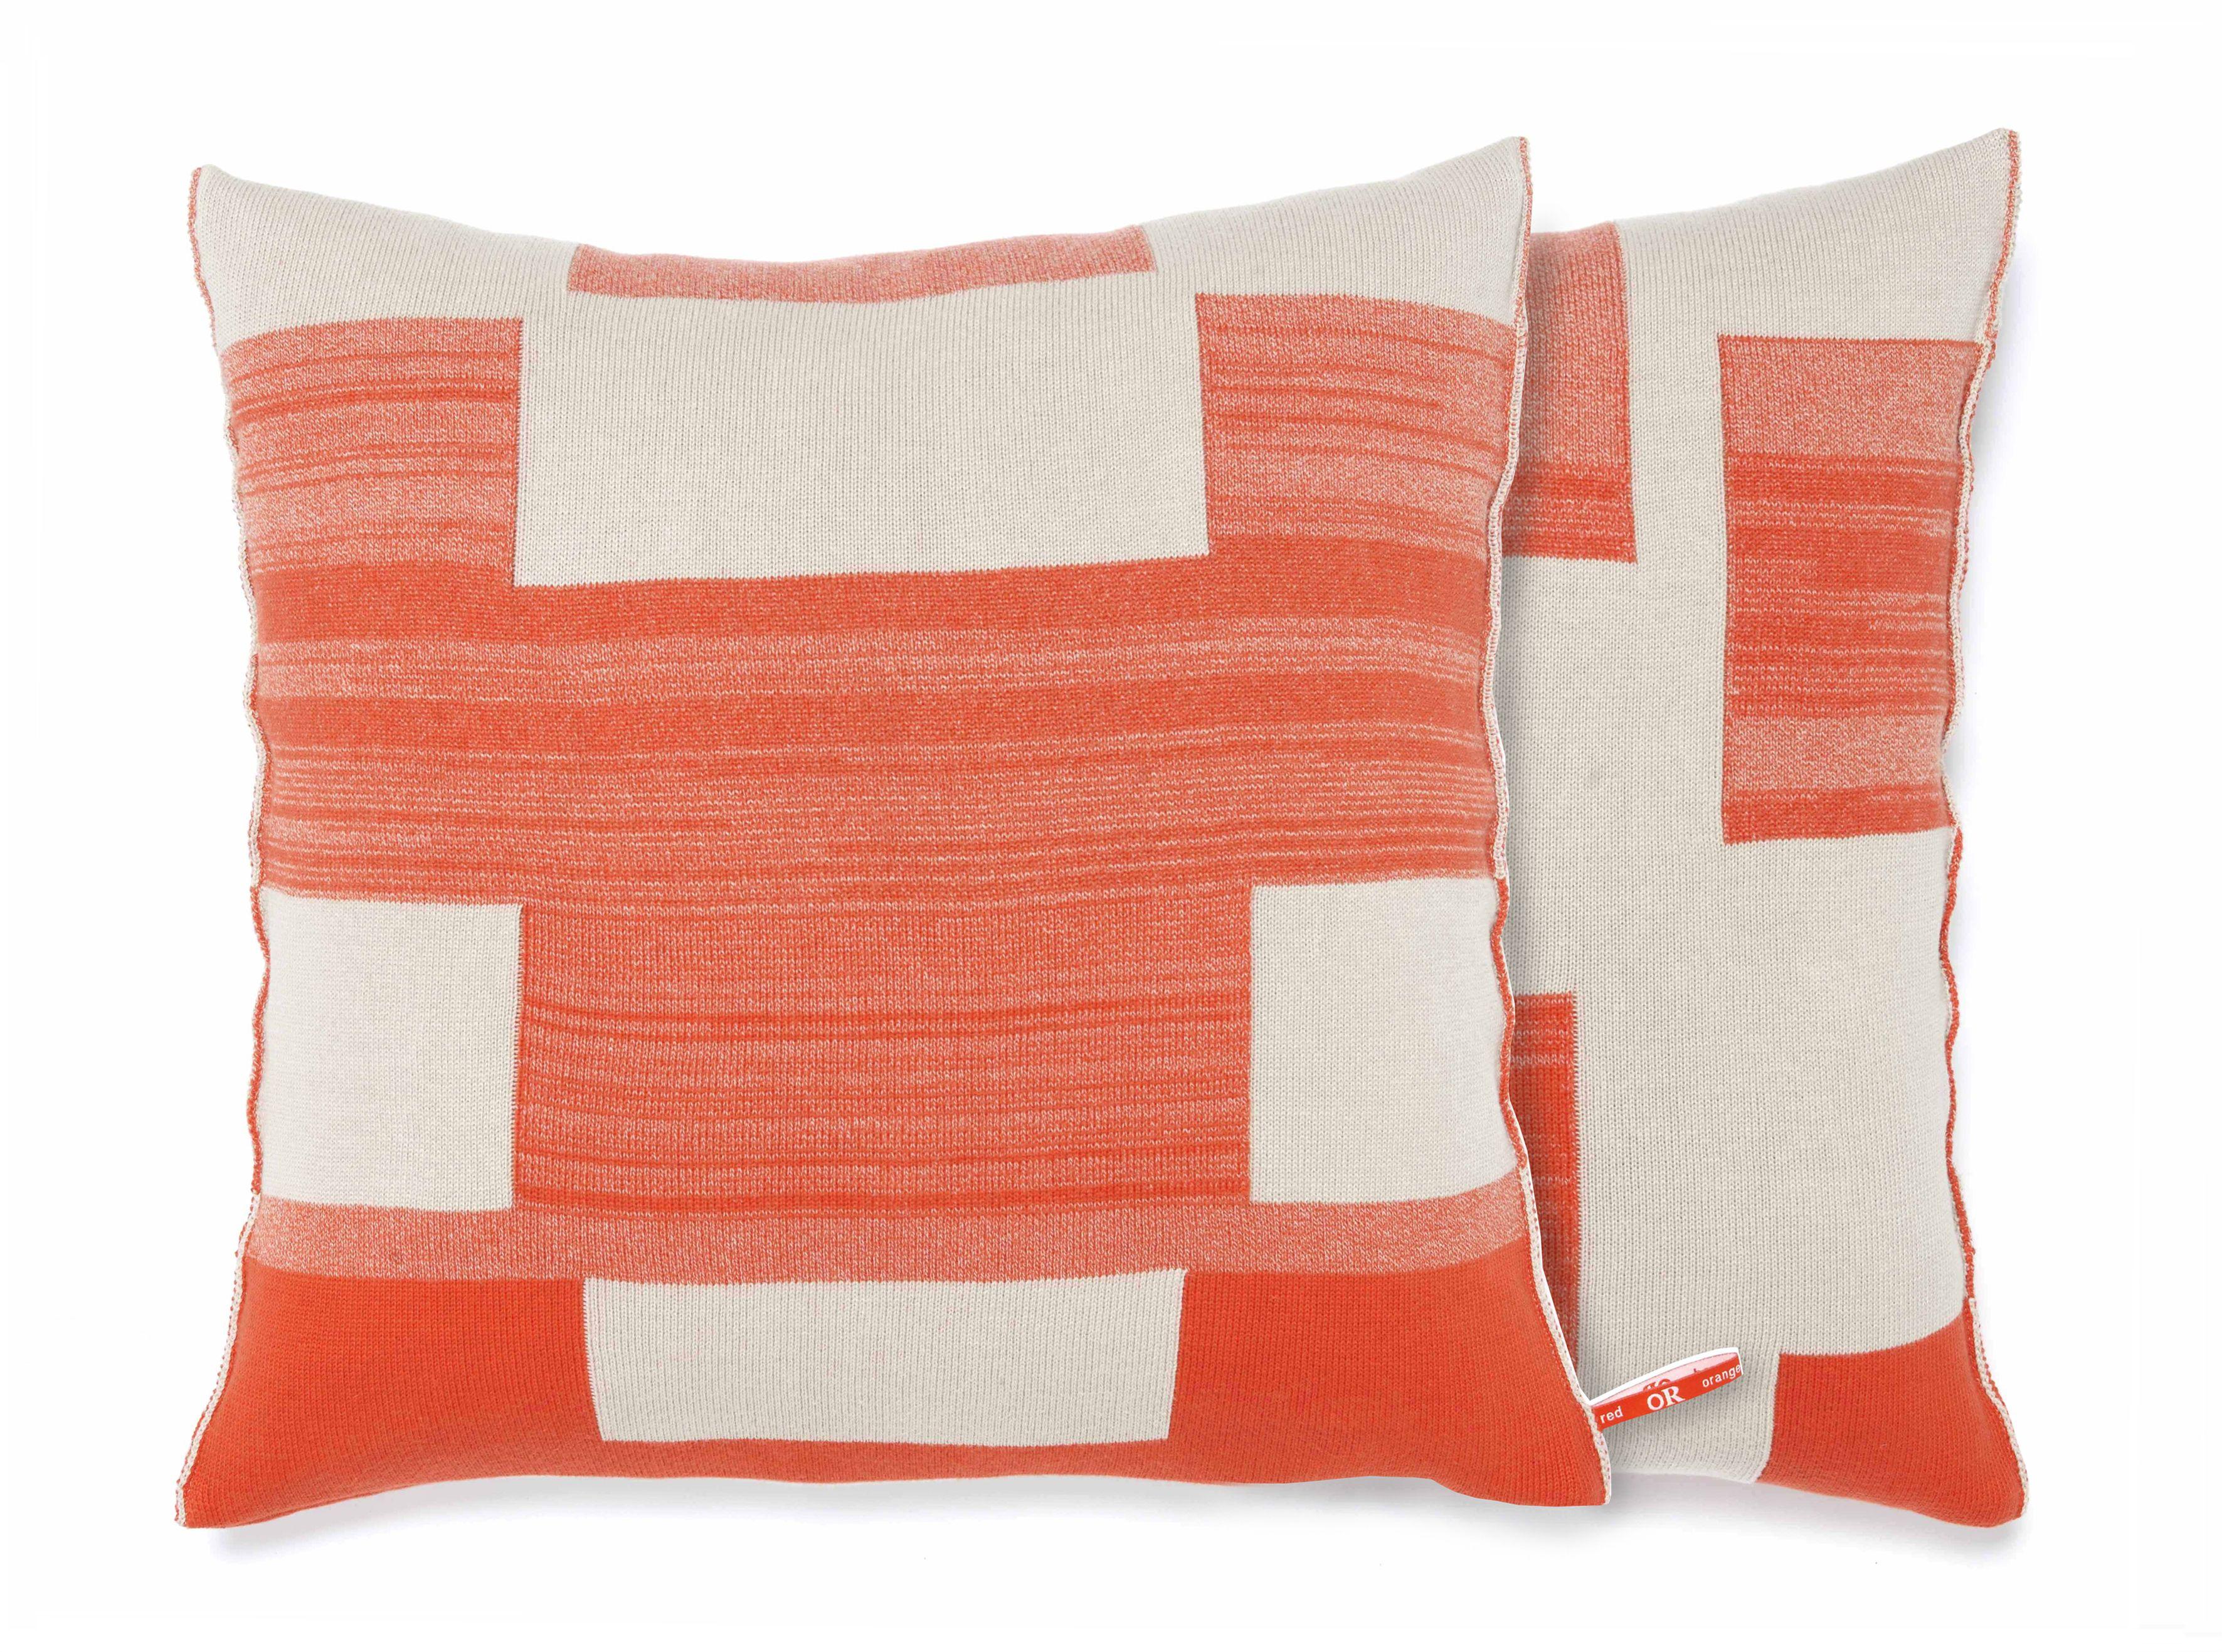 Orange or red blocks kussens prachtig gebreid uit organisch